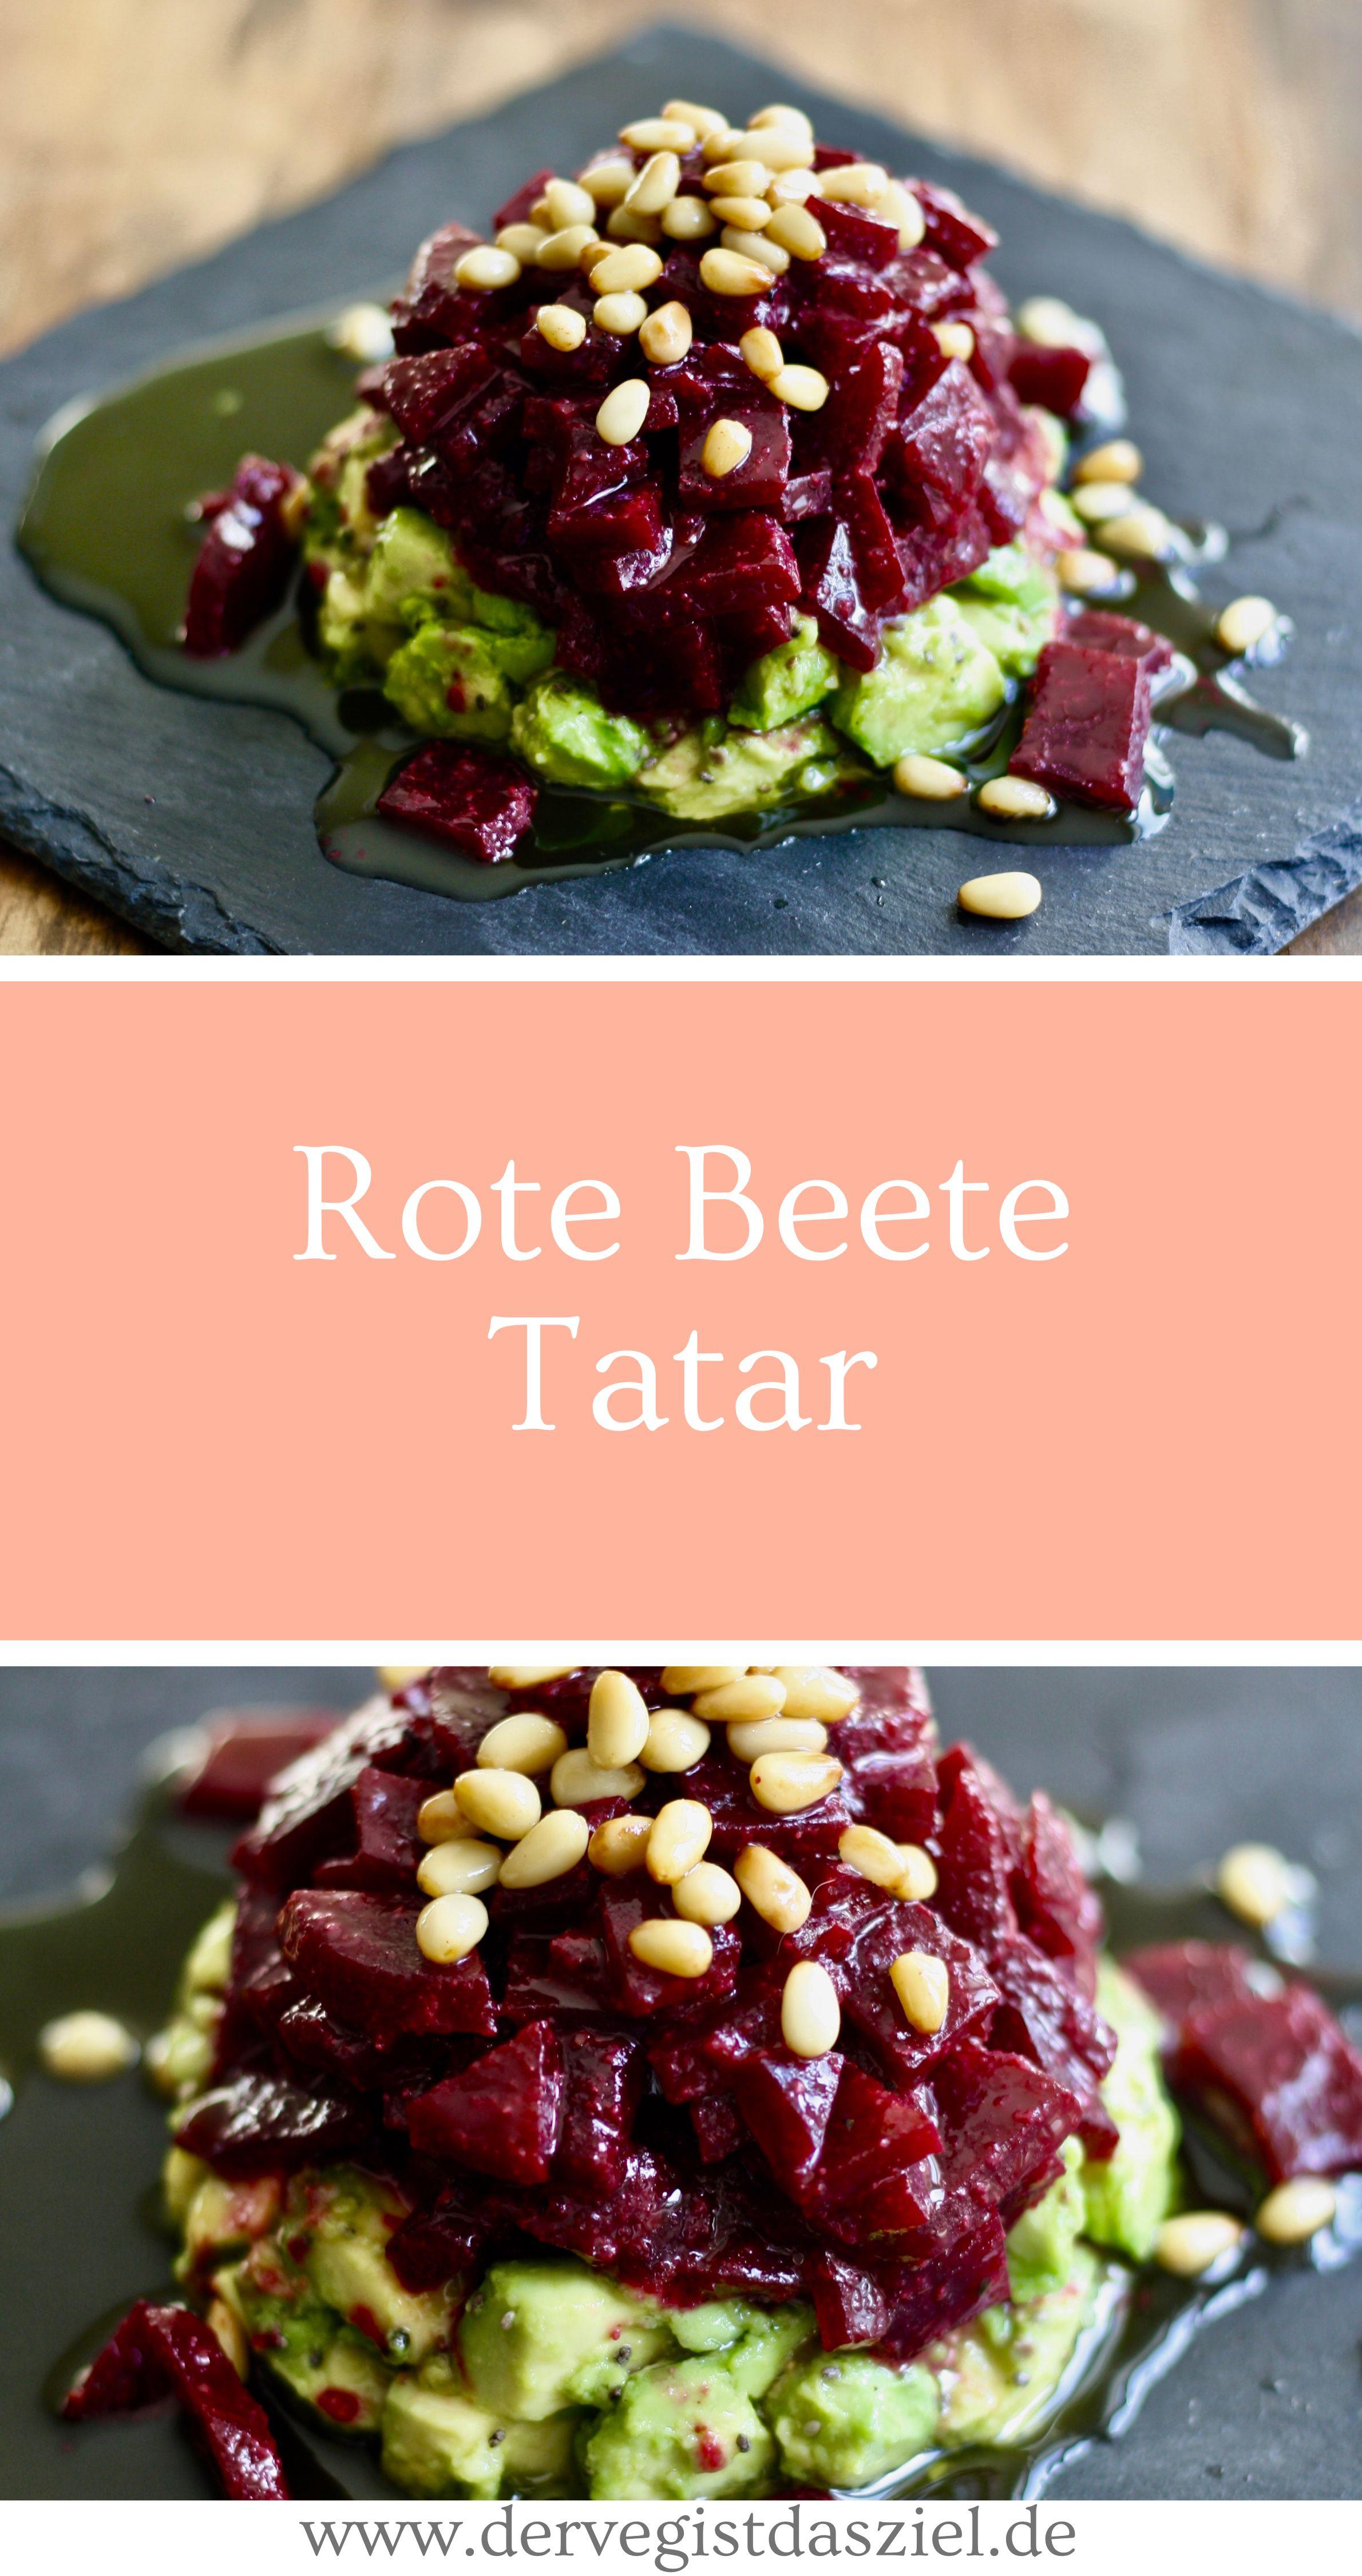 Rote Beete Tatar